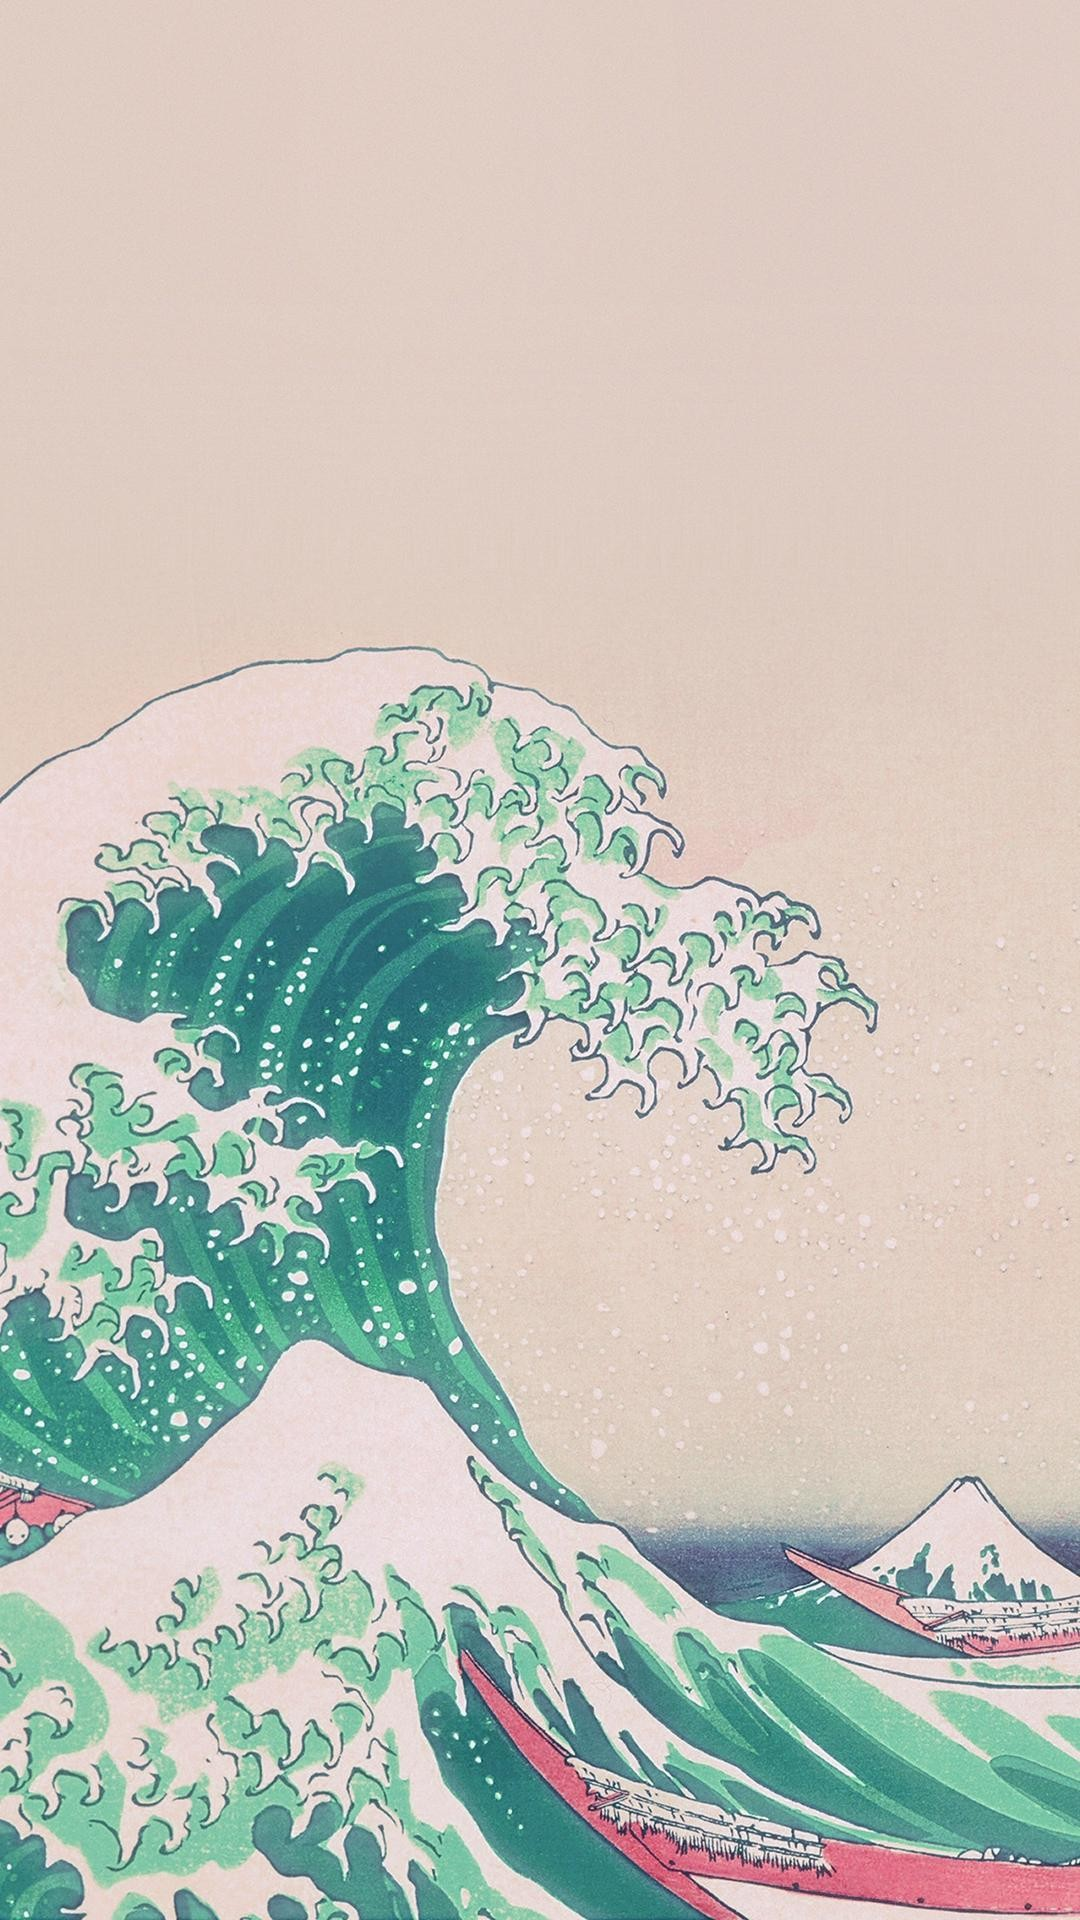 Japanese-painting-old-wallpaper.-Sea-painting-japan-ancient